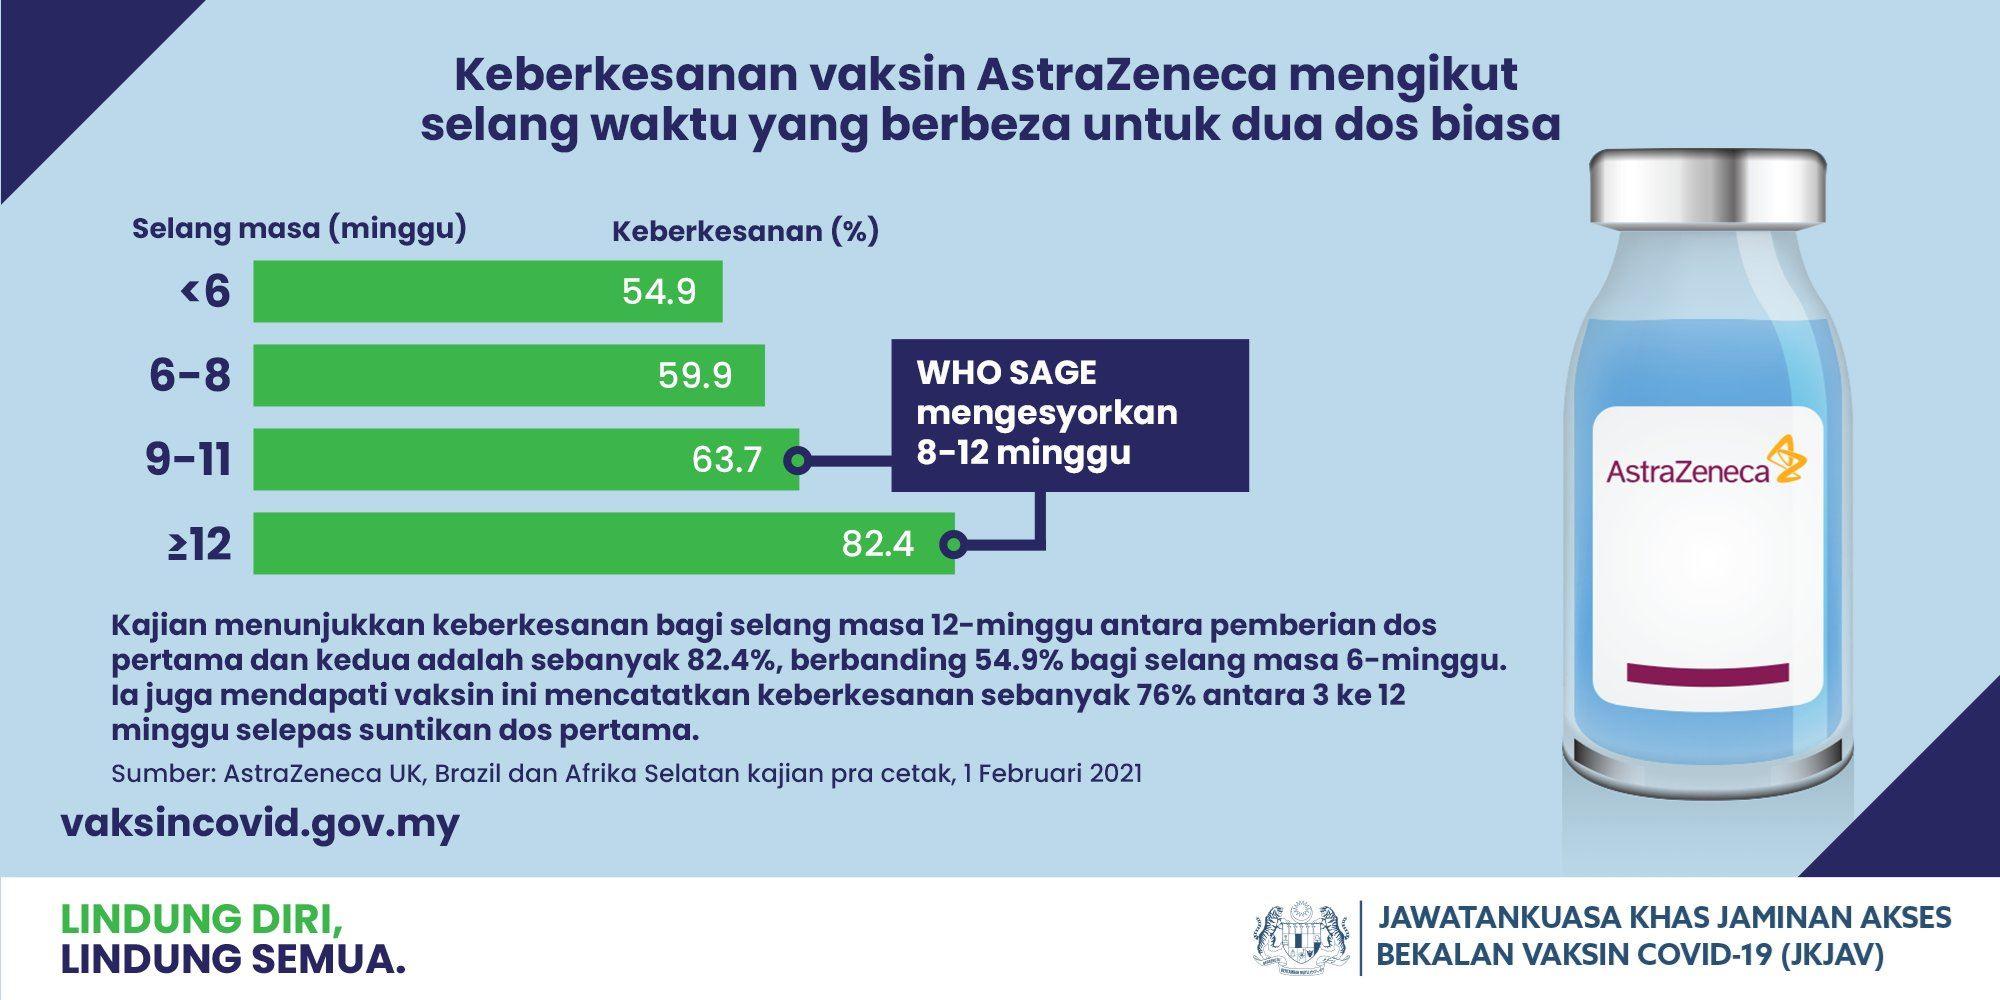 ini sebab vaksin astrazeneca perlu jarak 12 minggu antara dos 1 dan 2